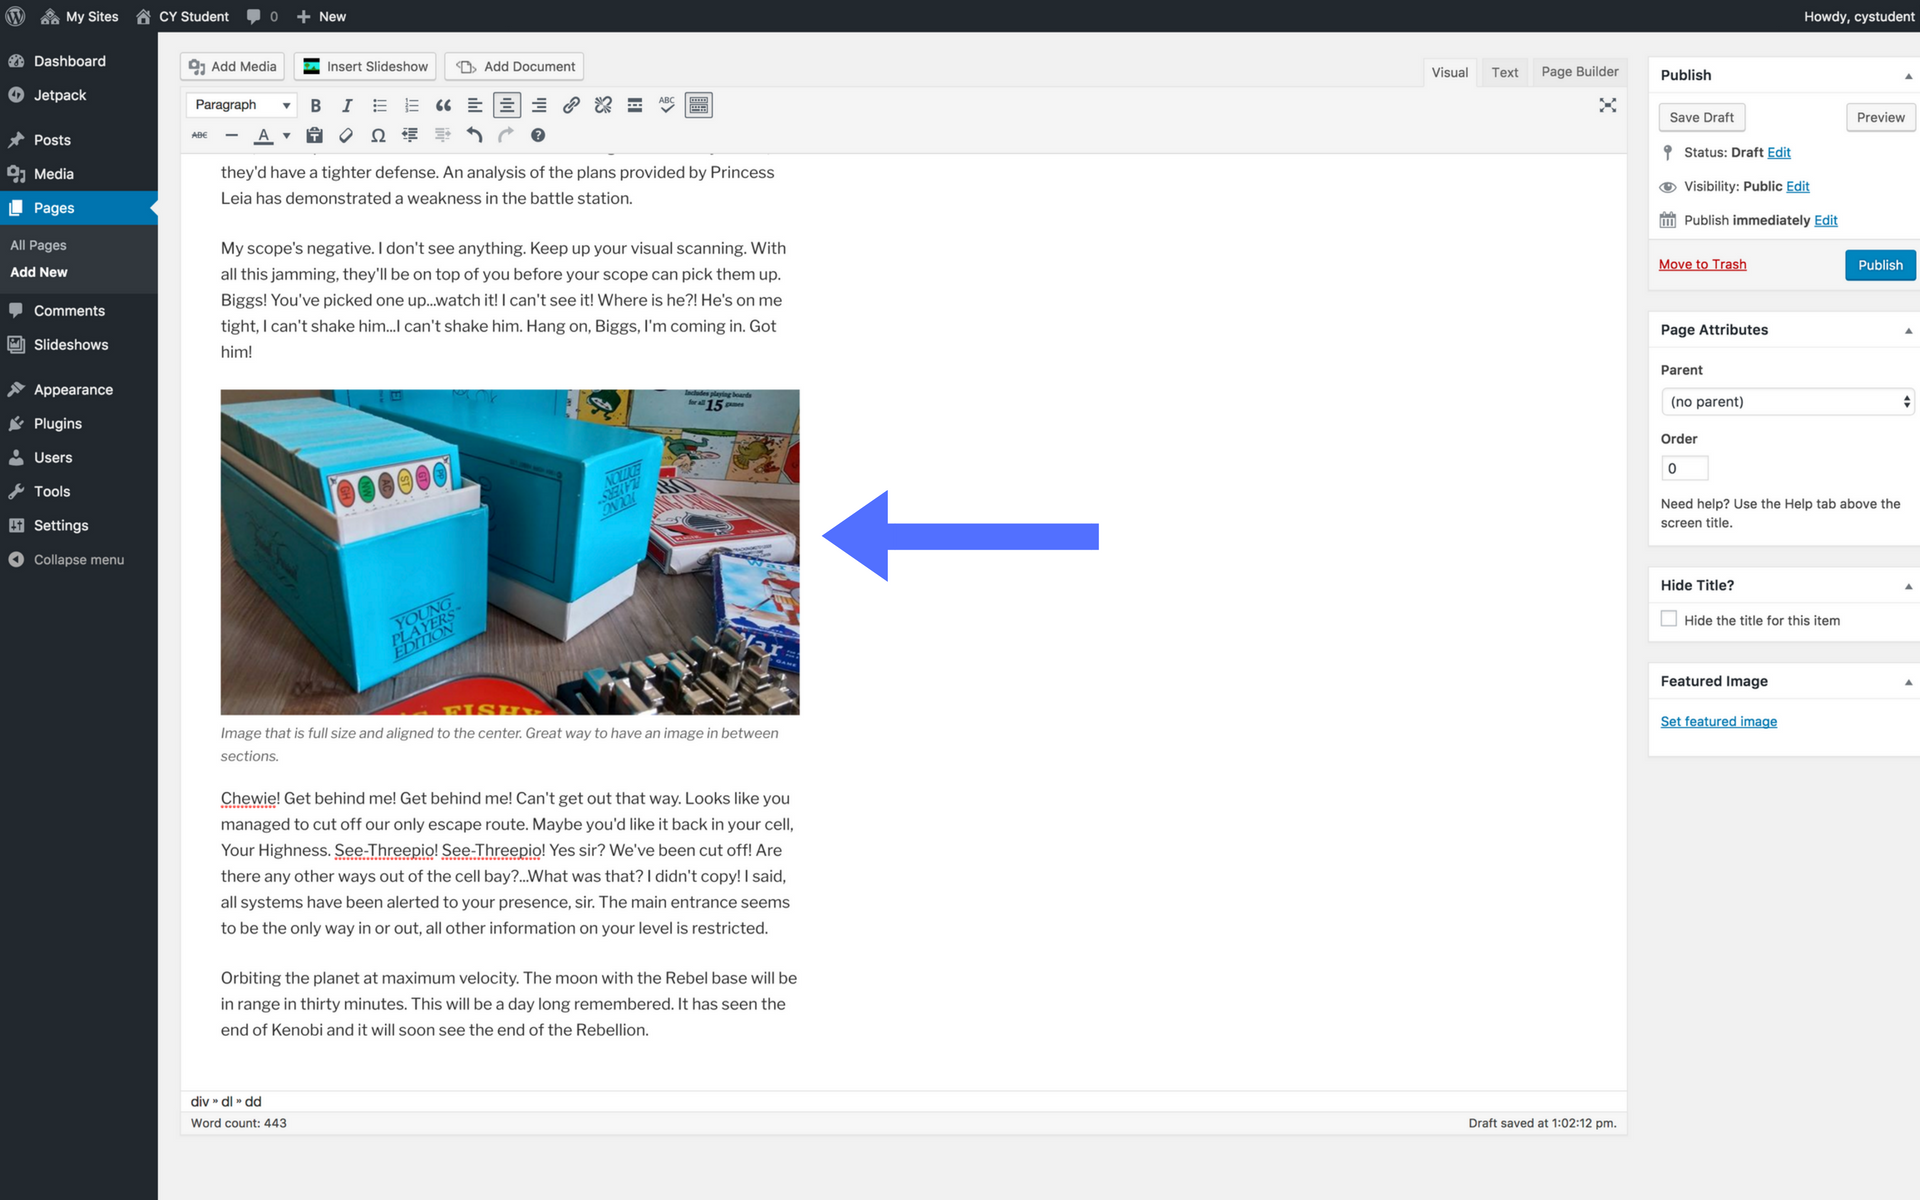 Adding images screenshot step 11